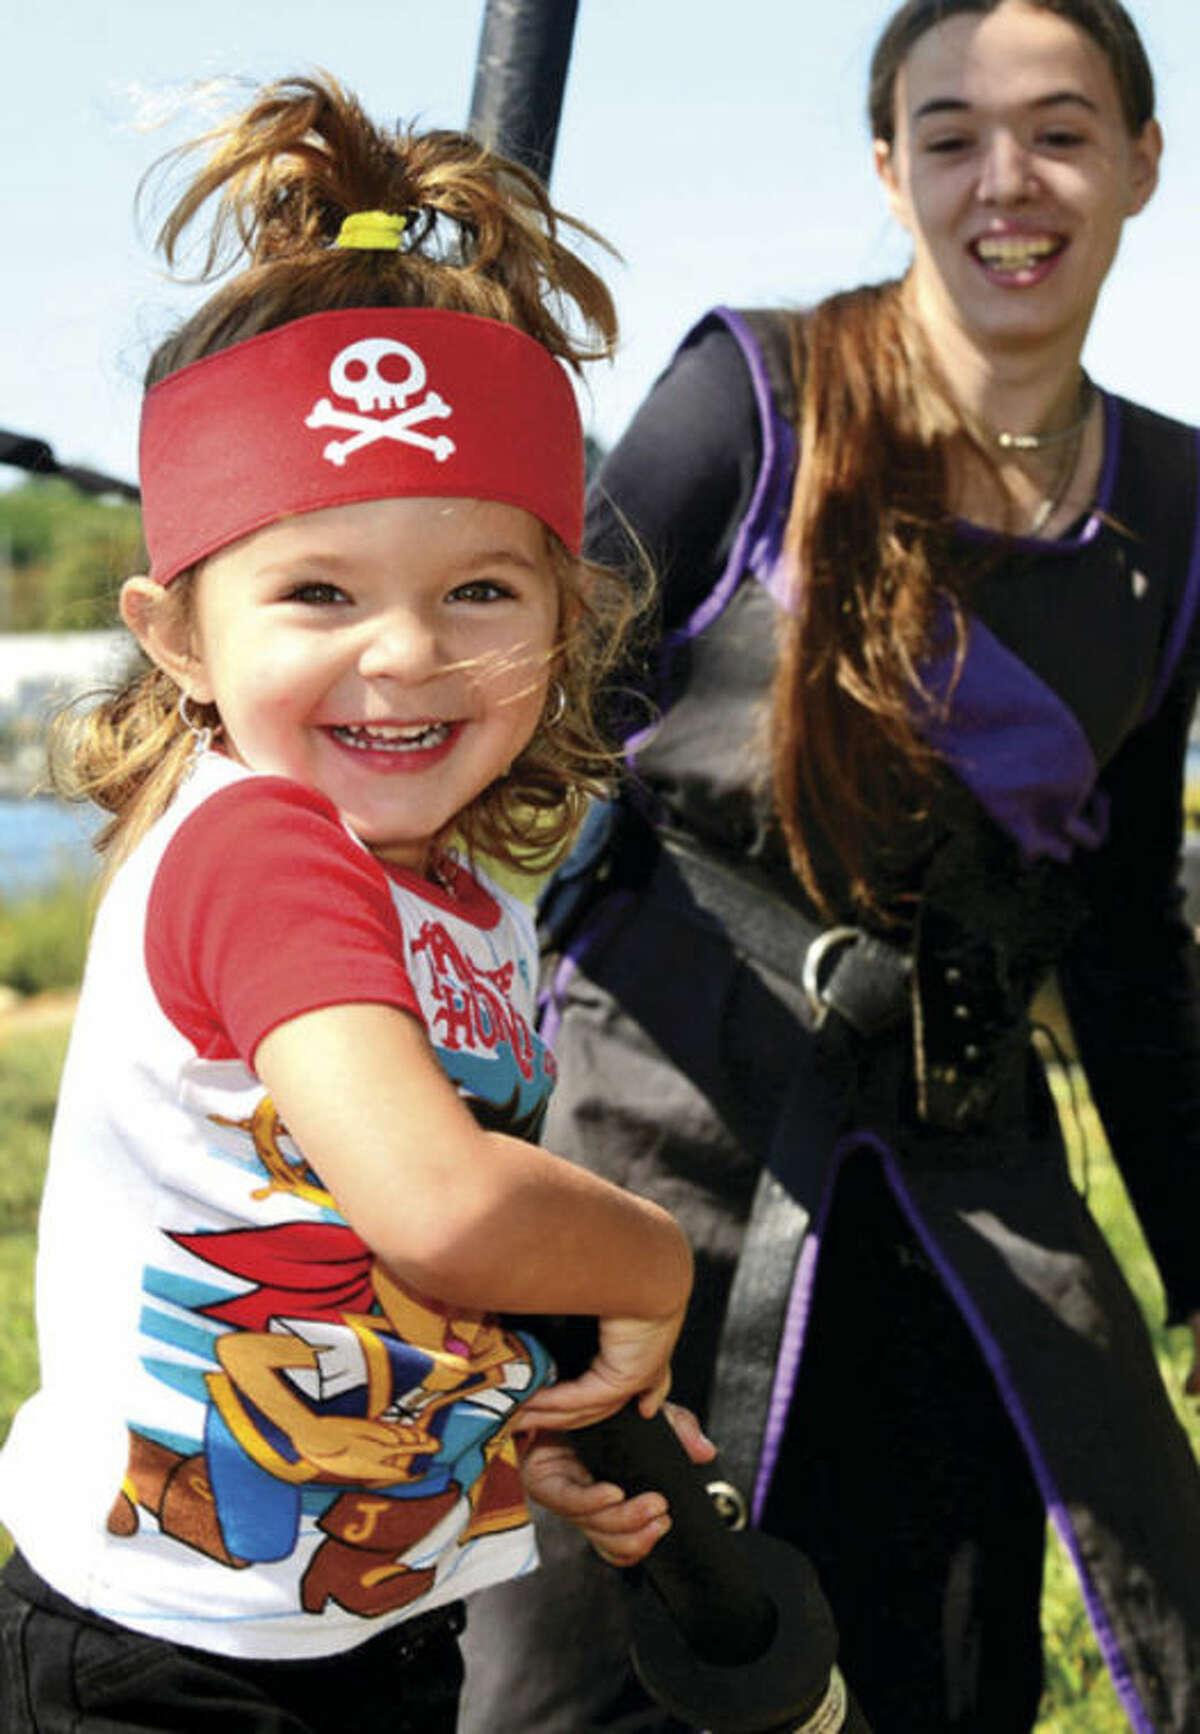 2 year old Savanna Eliasson enjoys visiting Pirate Cove during the 36th annual Norwalk Oyster Festival Saturday. Hour photo / Erik Trautmann